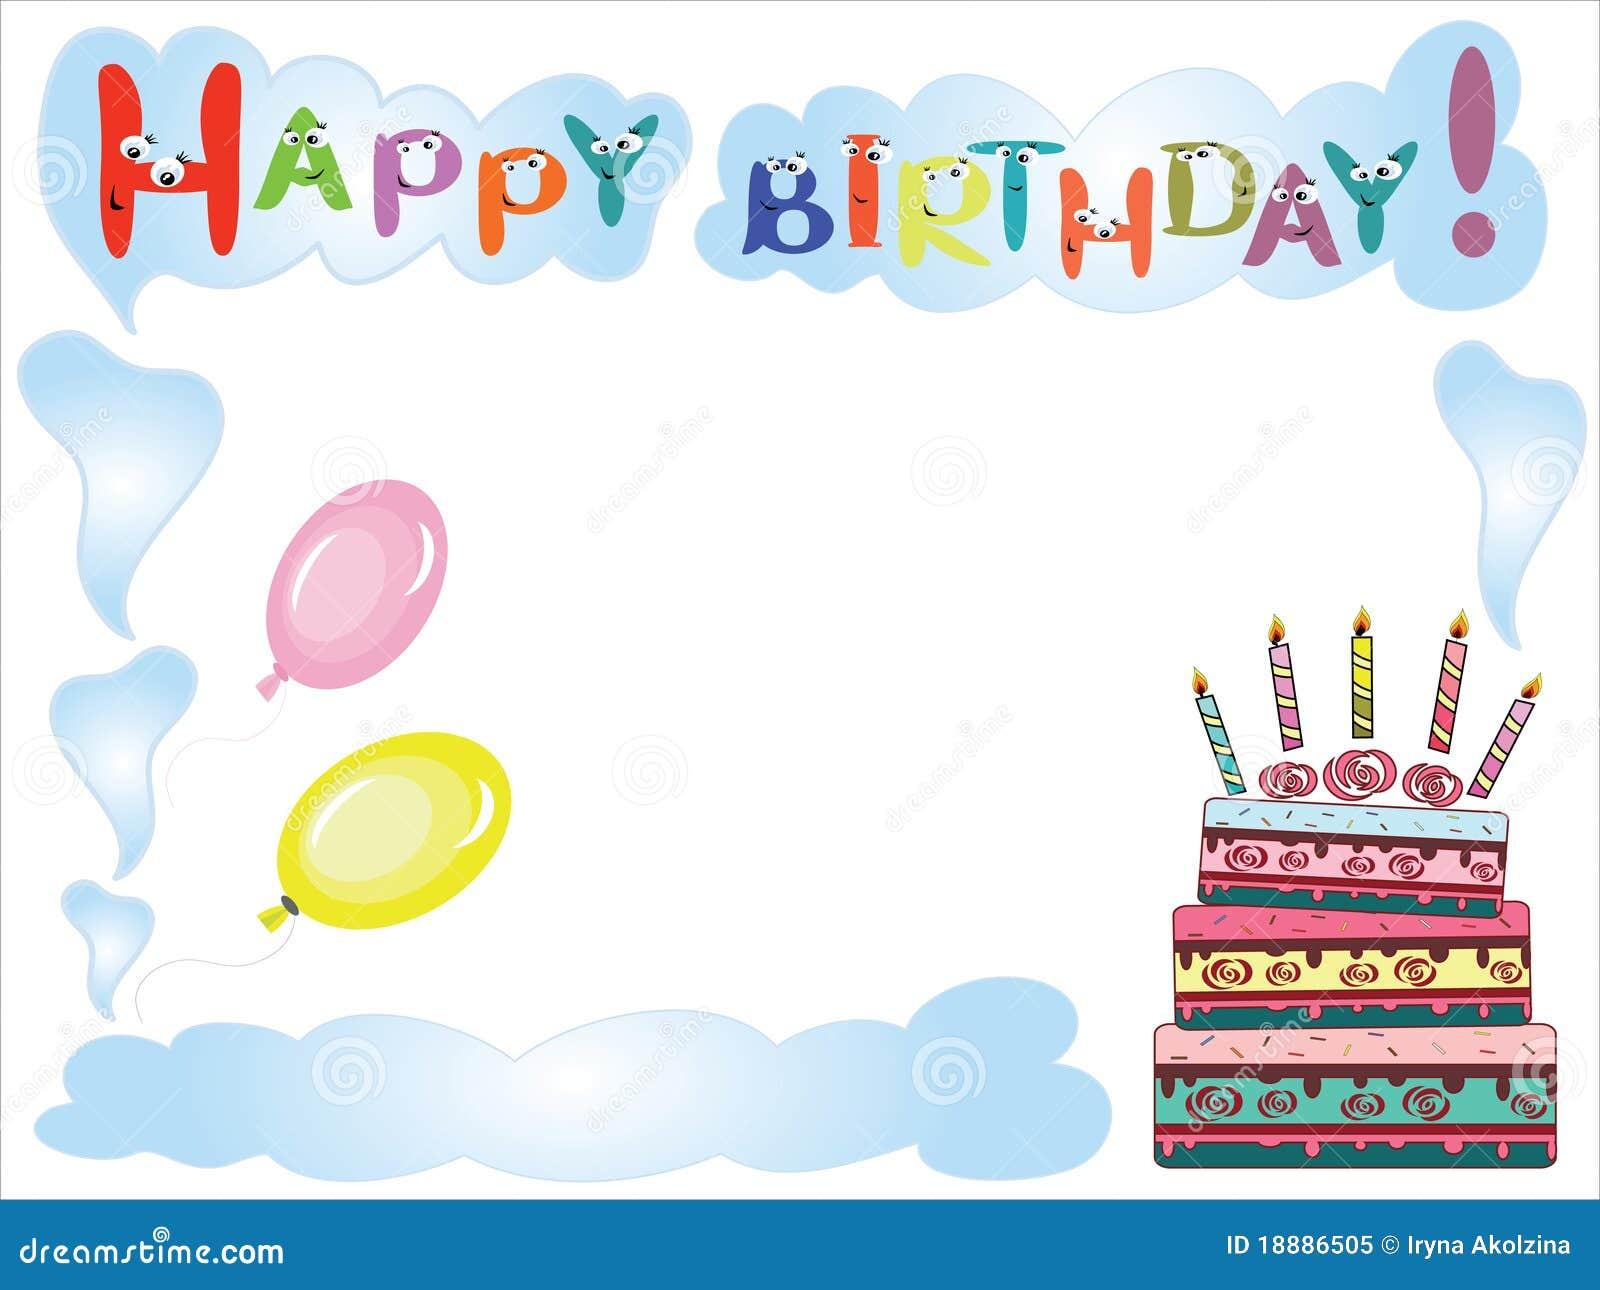 Birthday Frame Royalty Free Stock Photo - Image: 18886505